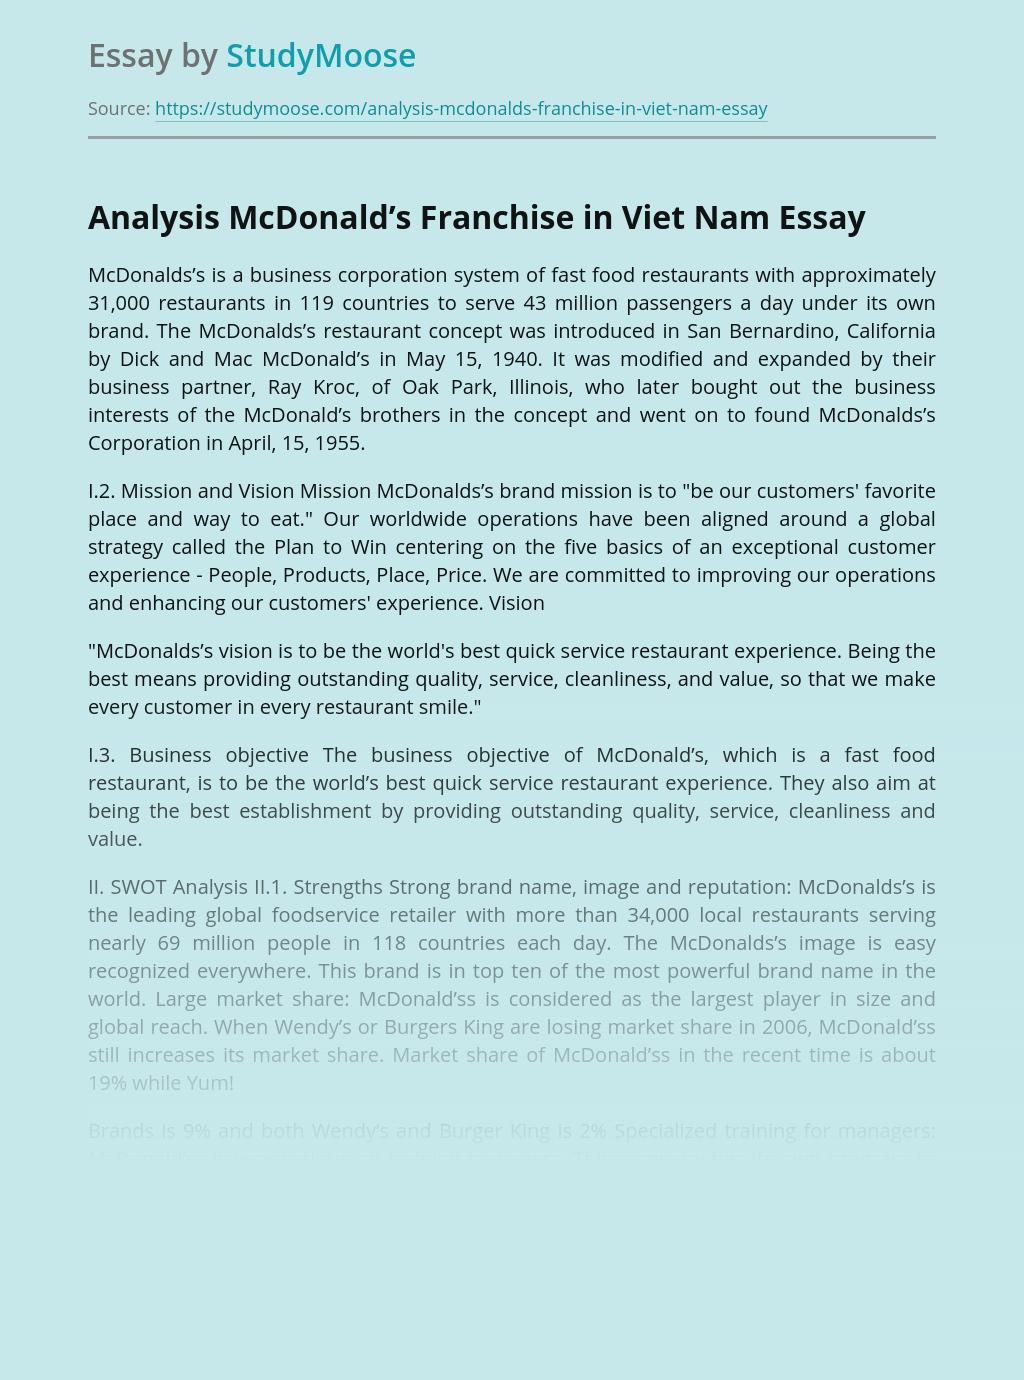 Analysis McDonald's Franchise in Viet Nam